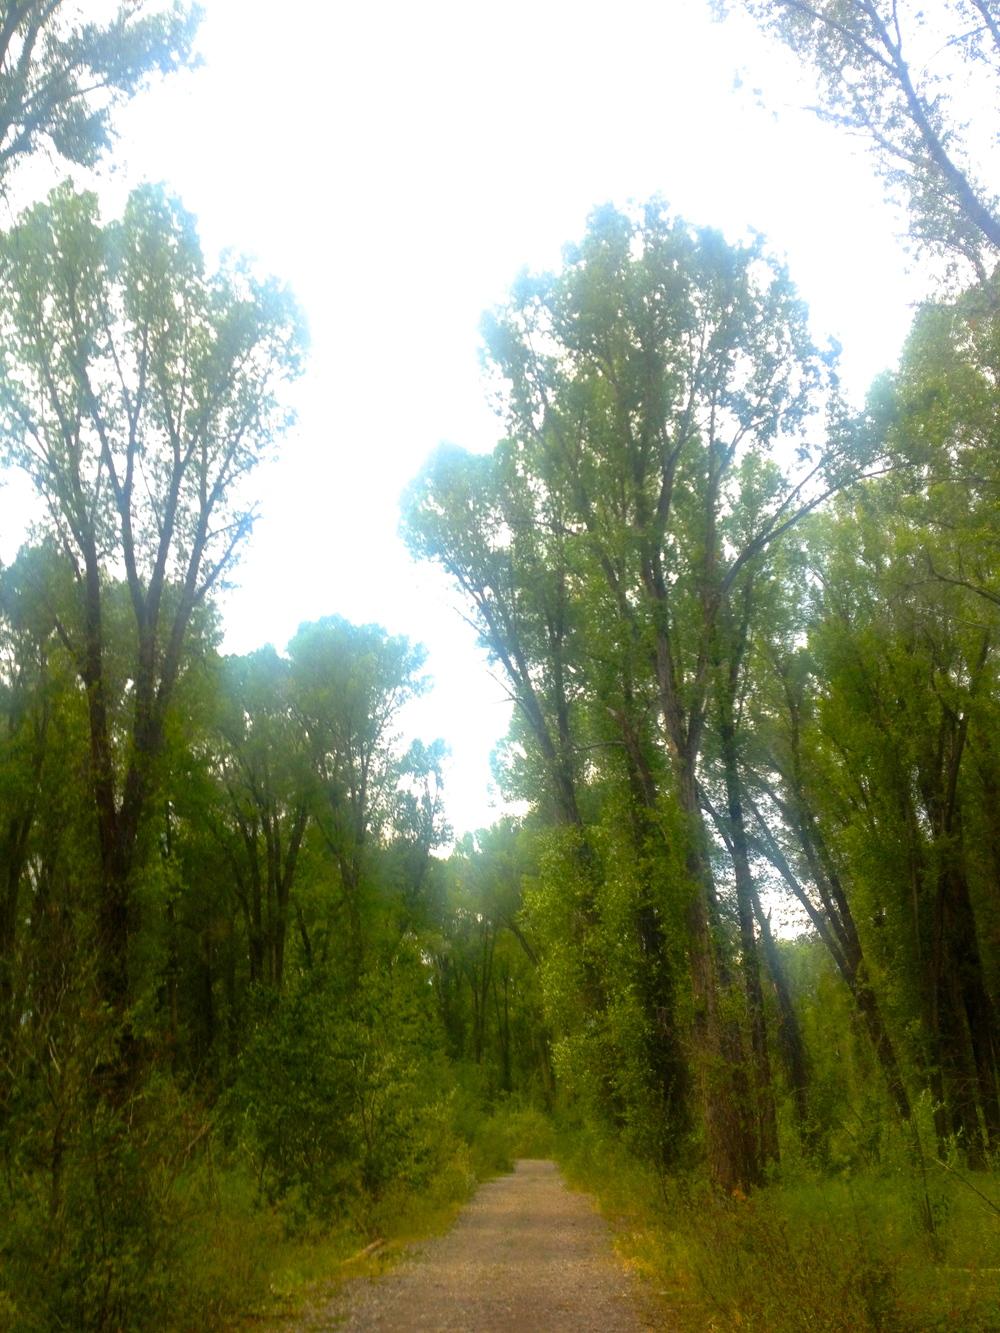 South Park Levee Trail, Jackson, WY